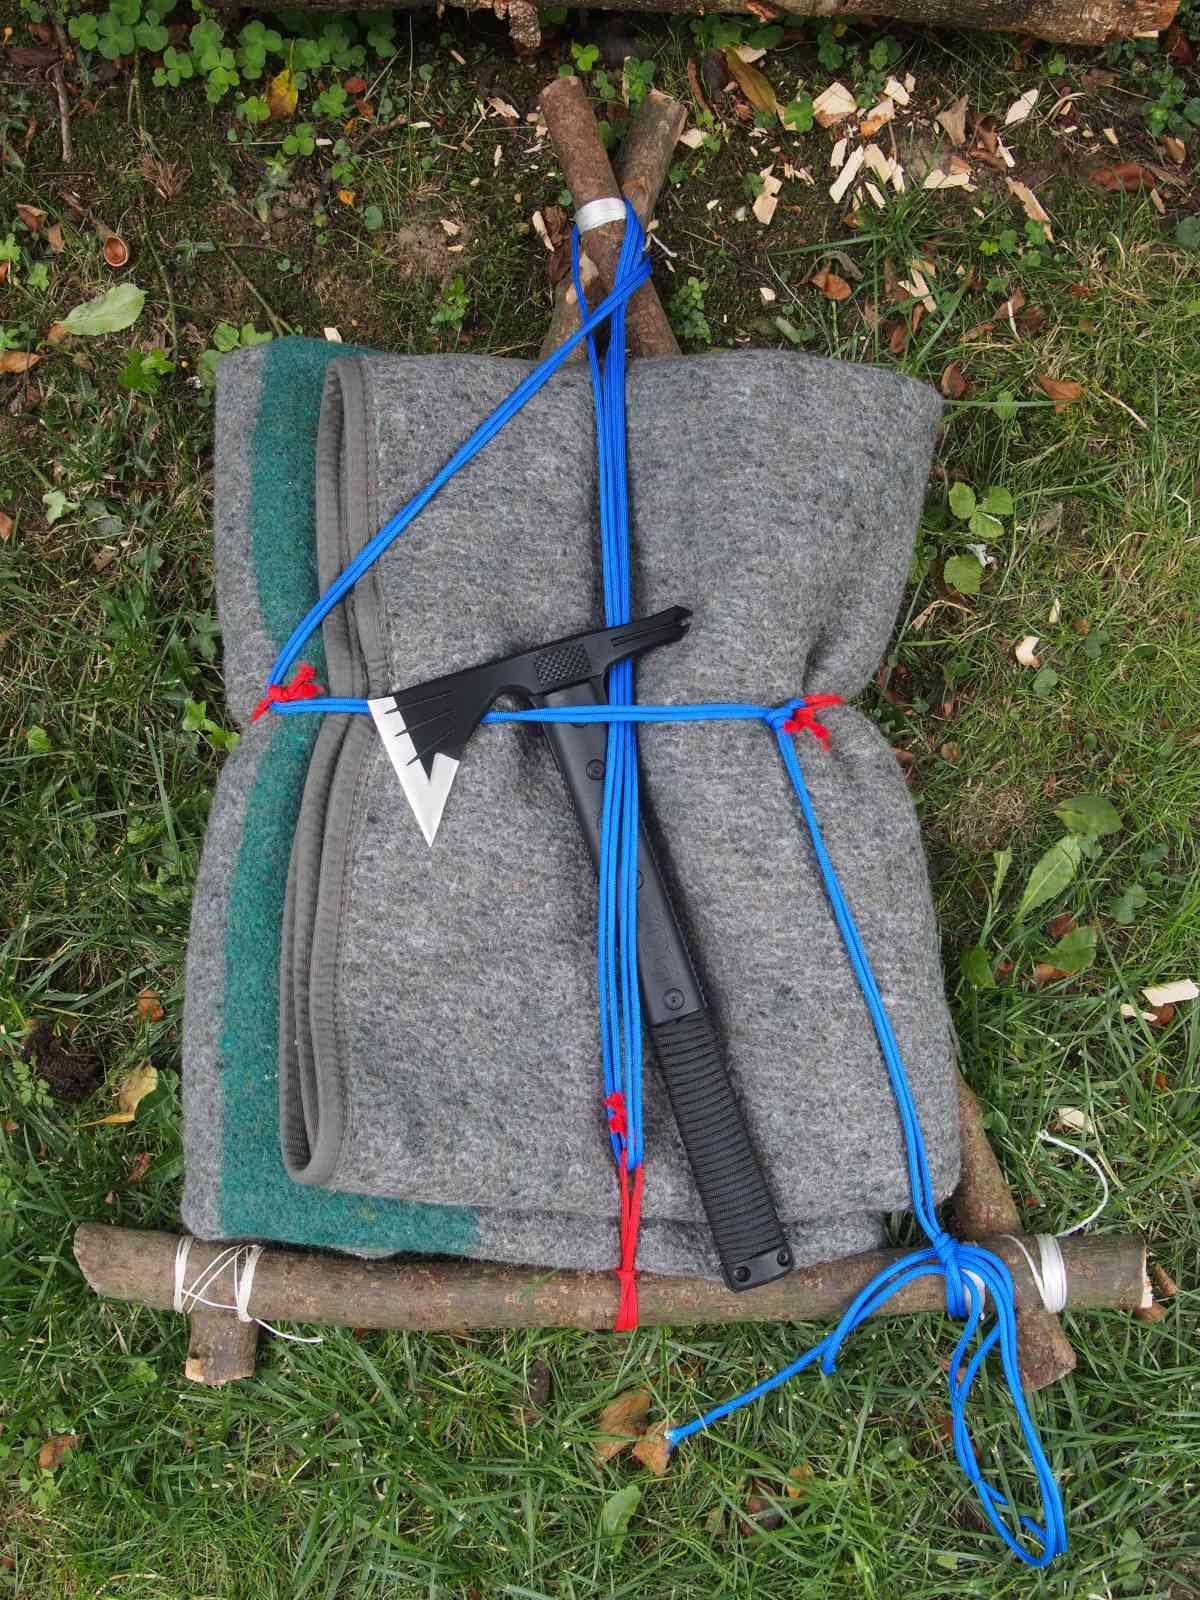 Roycroft-Frame - Gepäckbefestigung 13